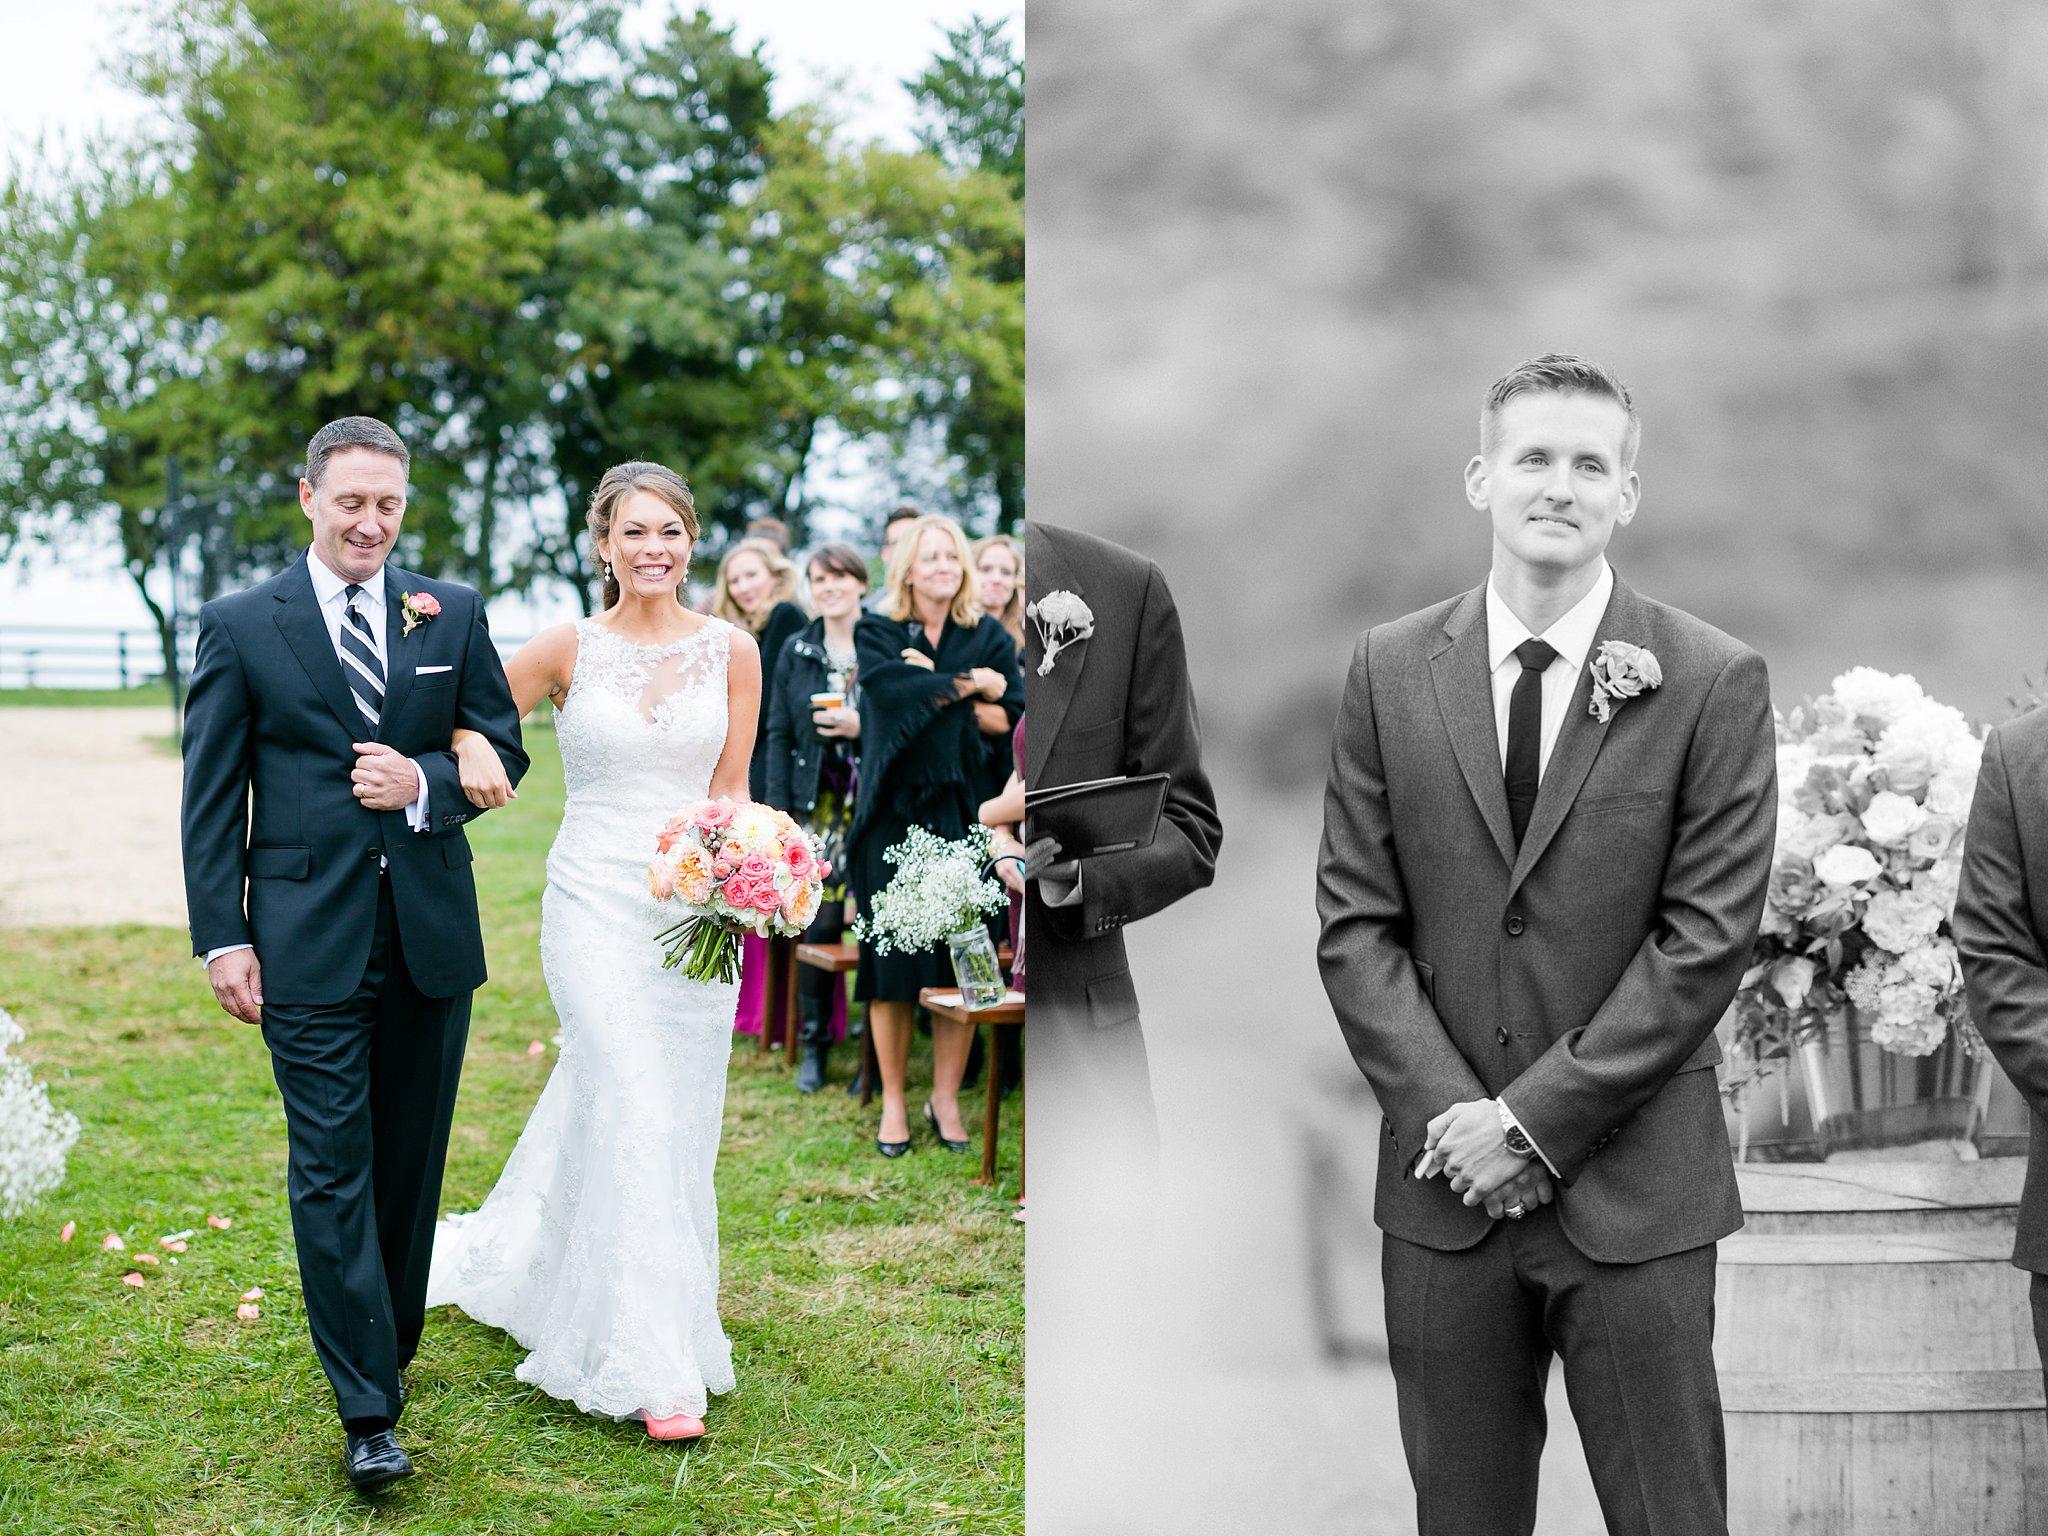 Stone Tower Winery Wedding Photos Virginia Wedding Photographer Megan Kelsey Photography Sam & Angela-150.jpg